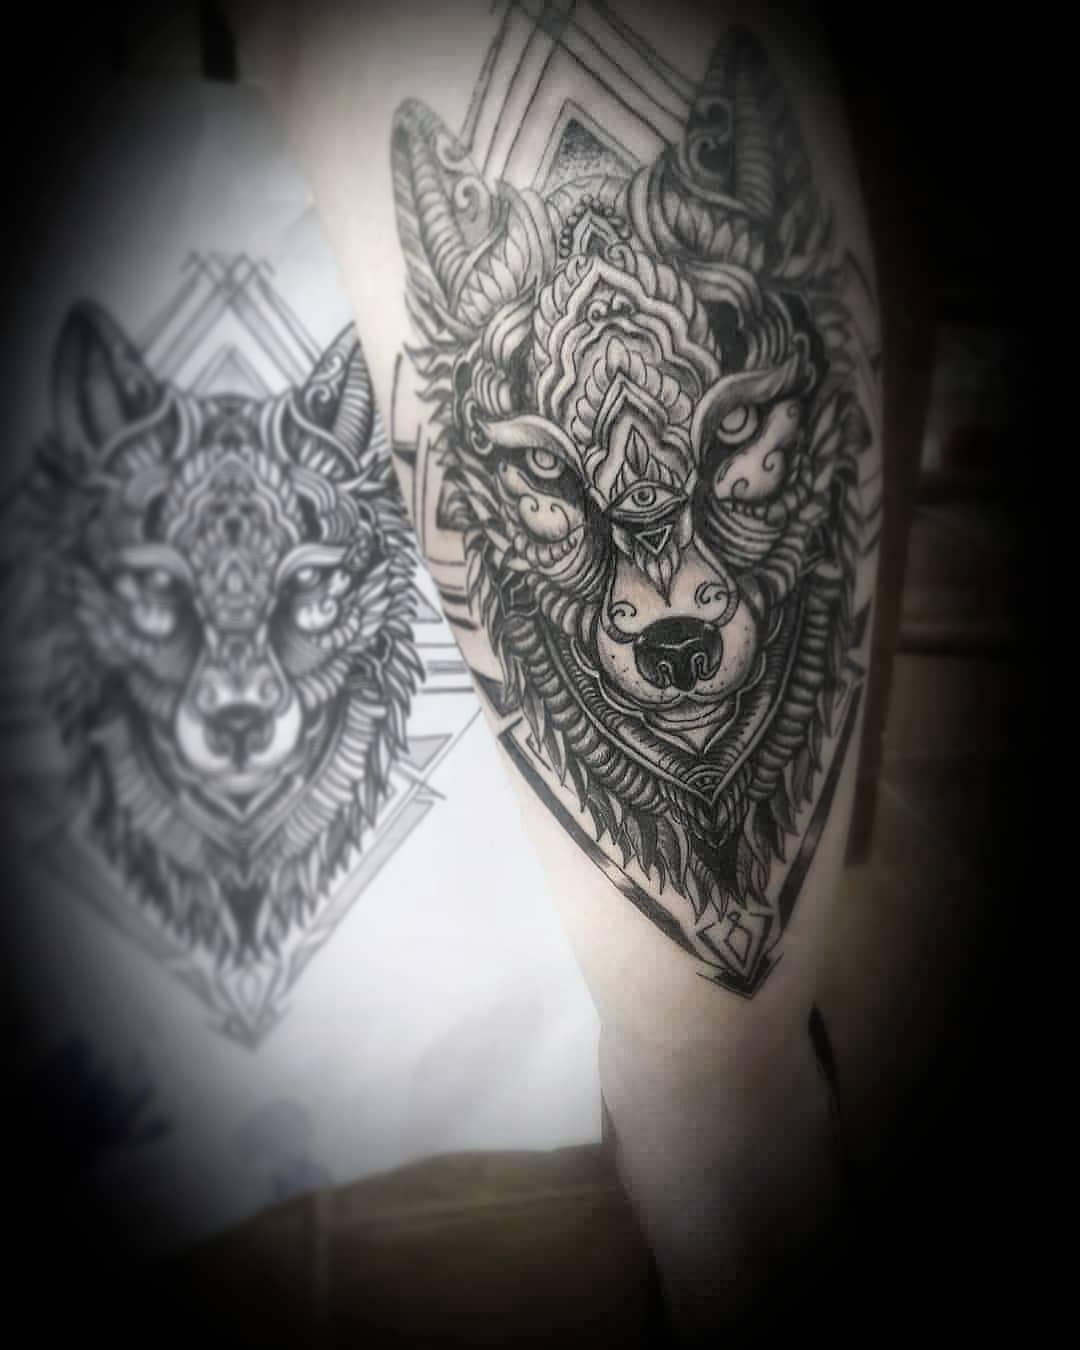 #throwback #2 years ago #tattoo #tattoos #tattooed #wolf #wolftattoo #blackandgraytattoo #tattoostyle #instatattoo #ink #inklove #inkedlife #inked #inkedgirls #inkedmoms #tattoolifestyle #tattoolovers #tattooaddict #thessaloniki #skg